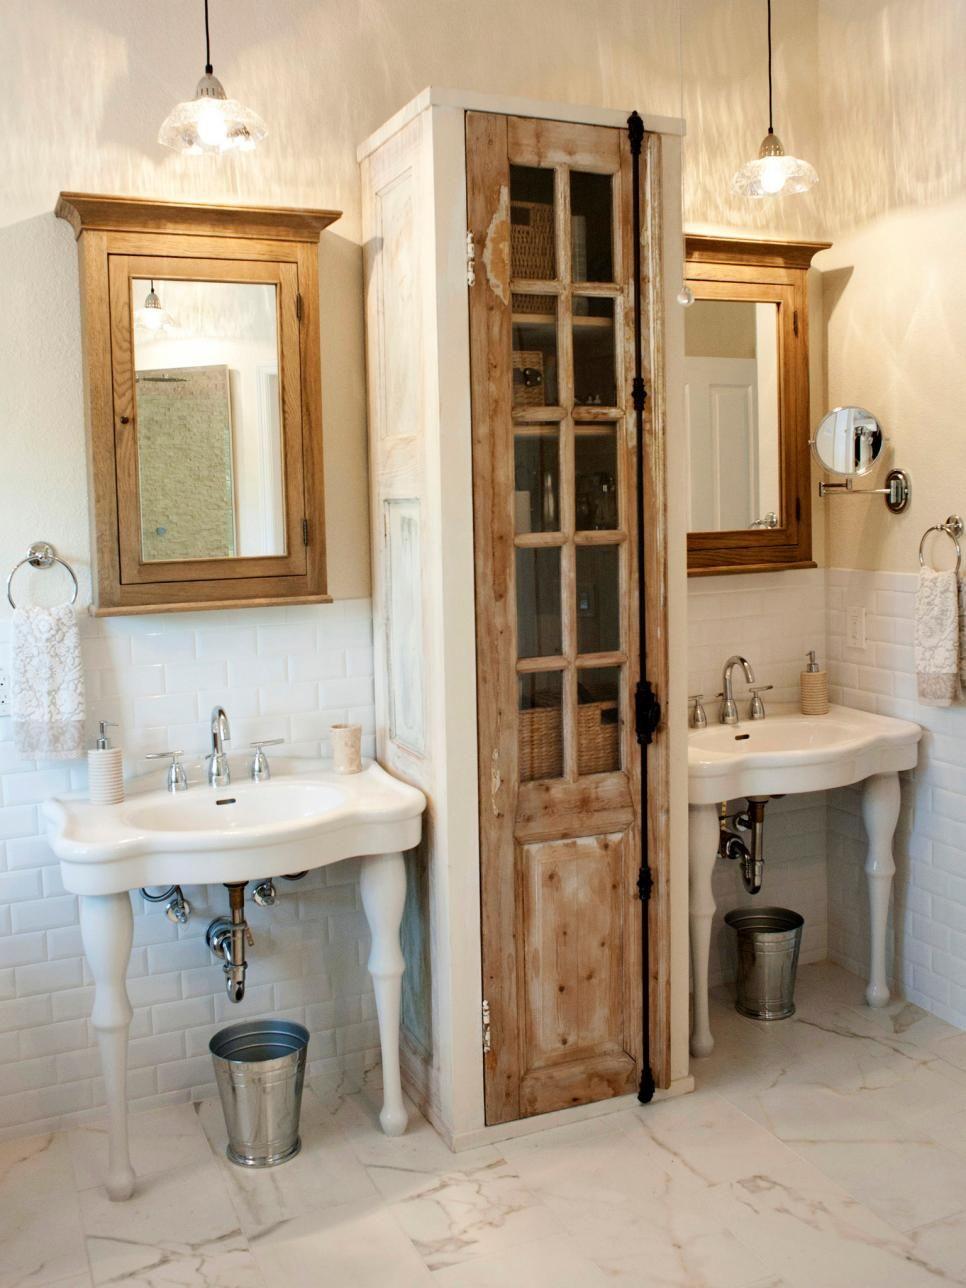 15 Smart Bath Storage Ideas Vintage Bathroom Cabinet Creative Bathroom Bathroom Storage [ 1288 x 966 Pixel ]